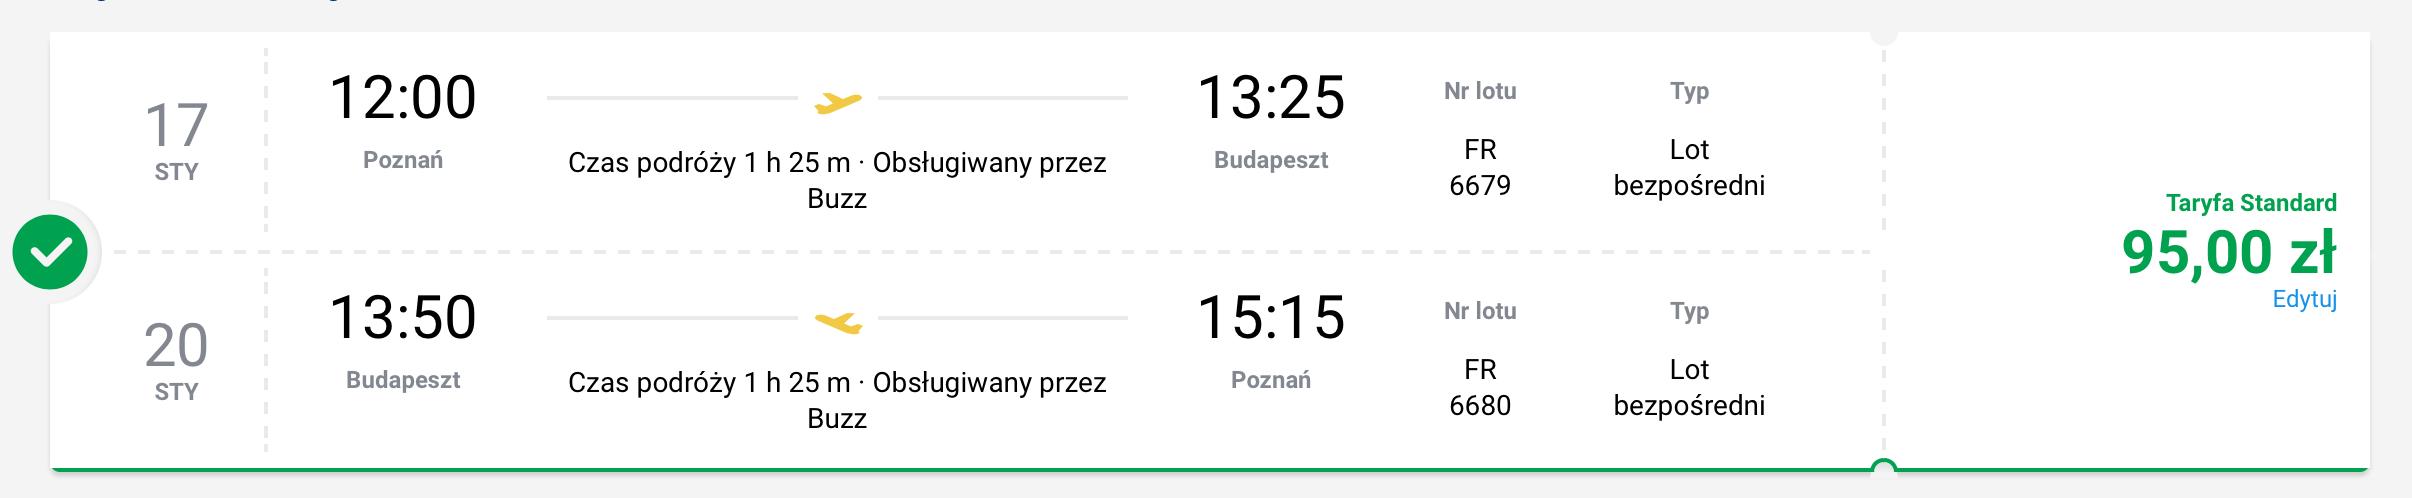 poznan budapeszt